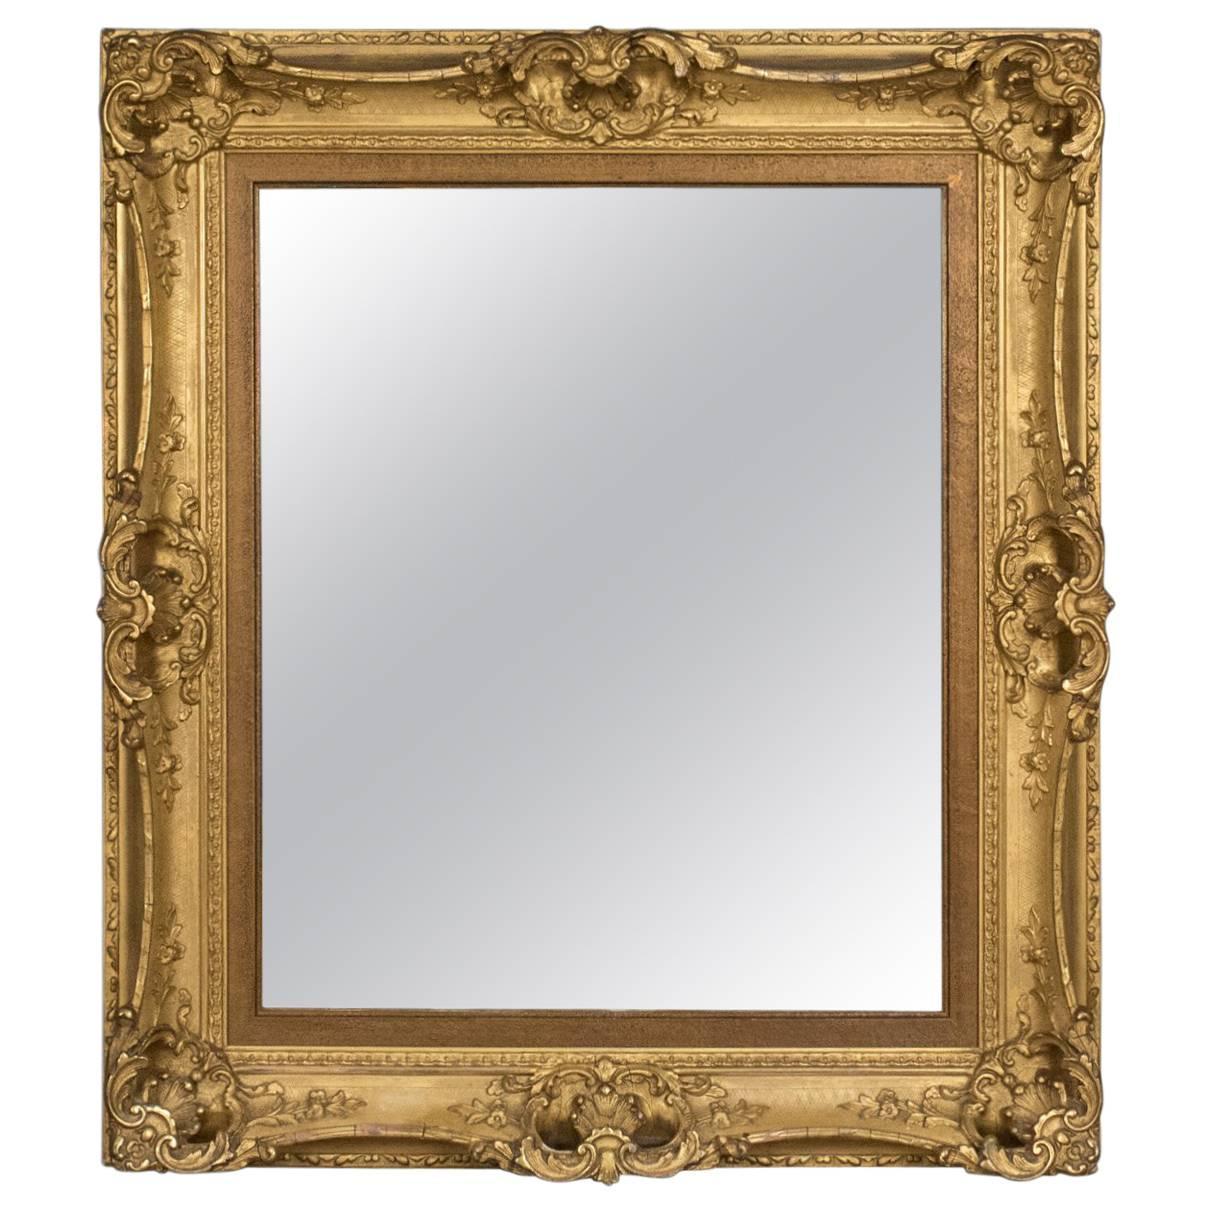 Early 19th Century Antique Gesso Gilt Overmantel Mirror Original Mercury Glass Mirrors